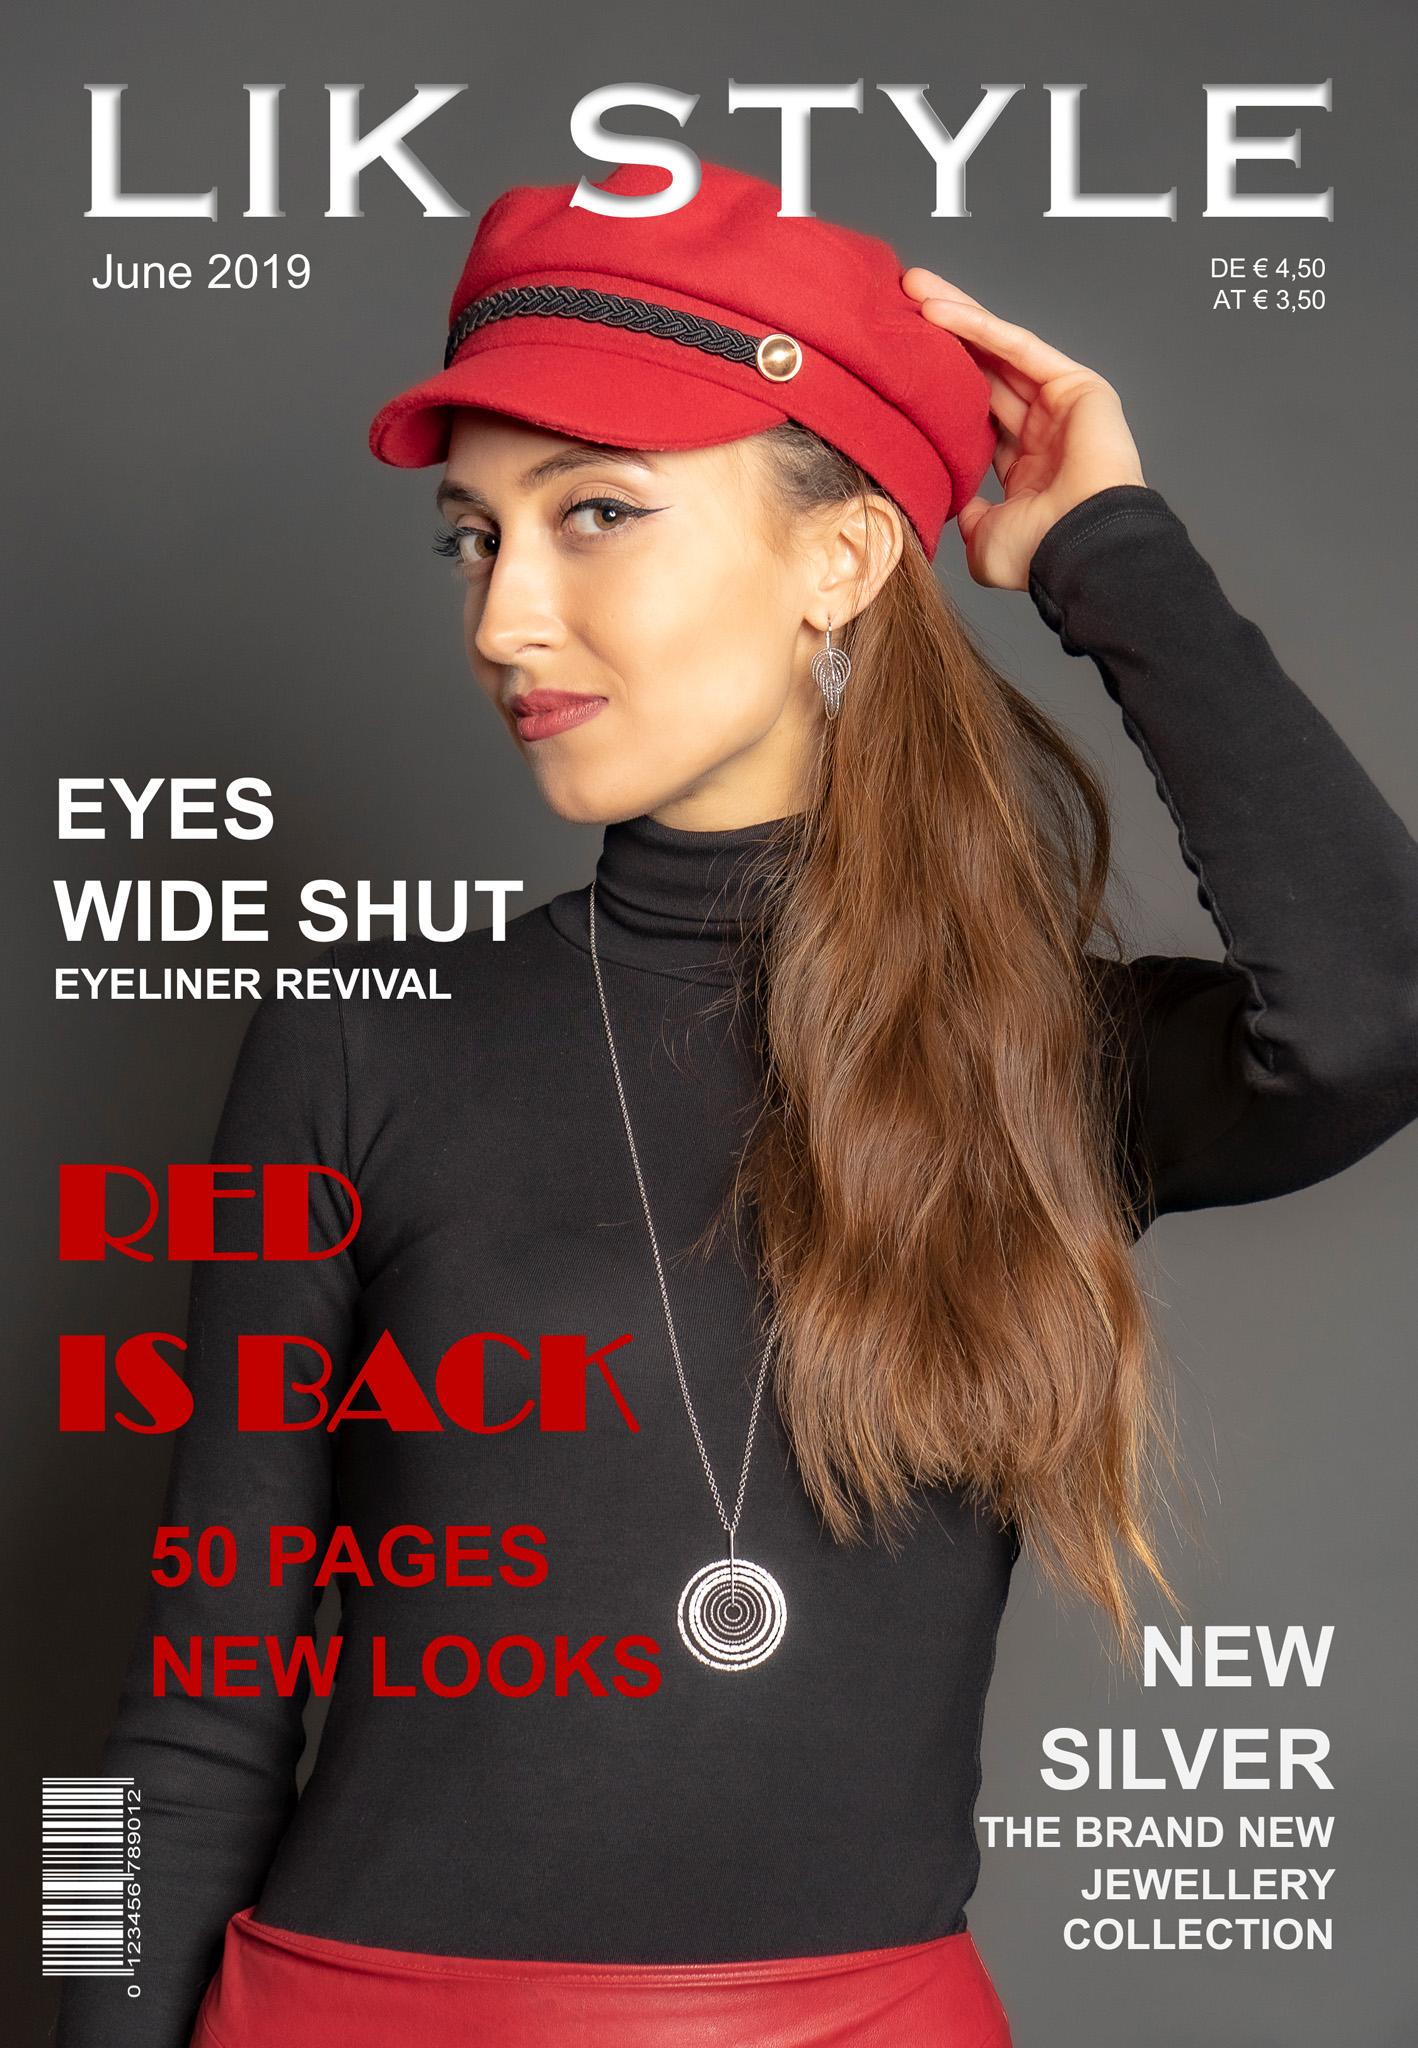 Fashion Cover NEU exp Kopie.jpg